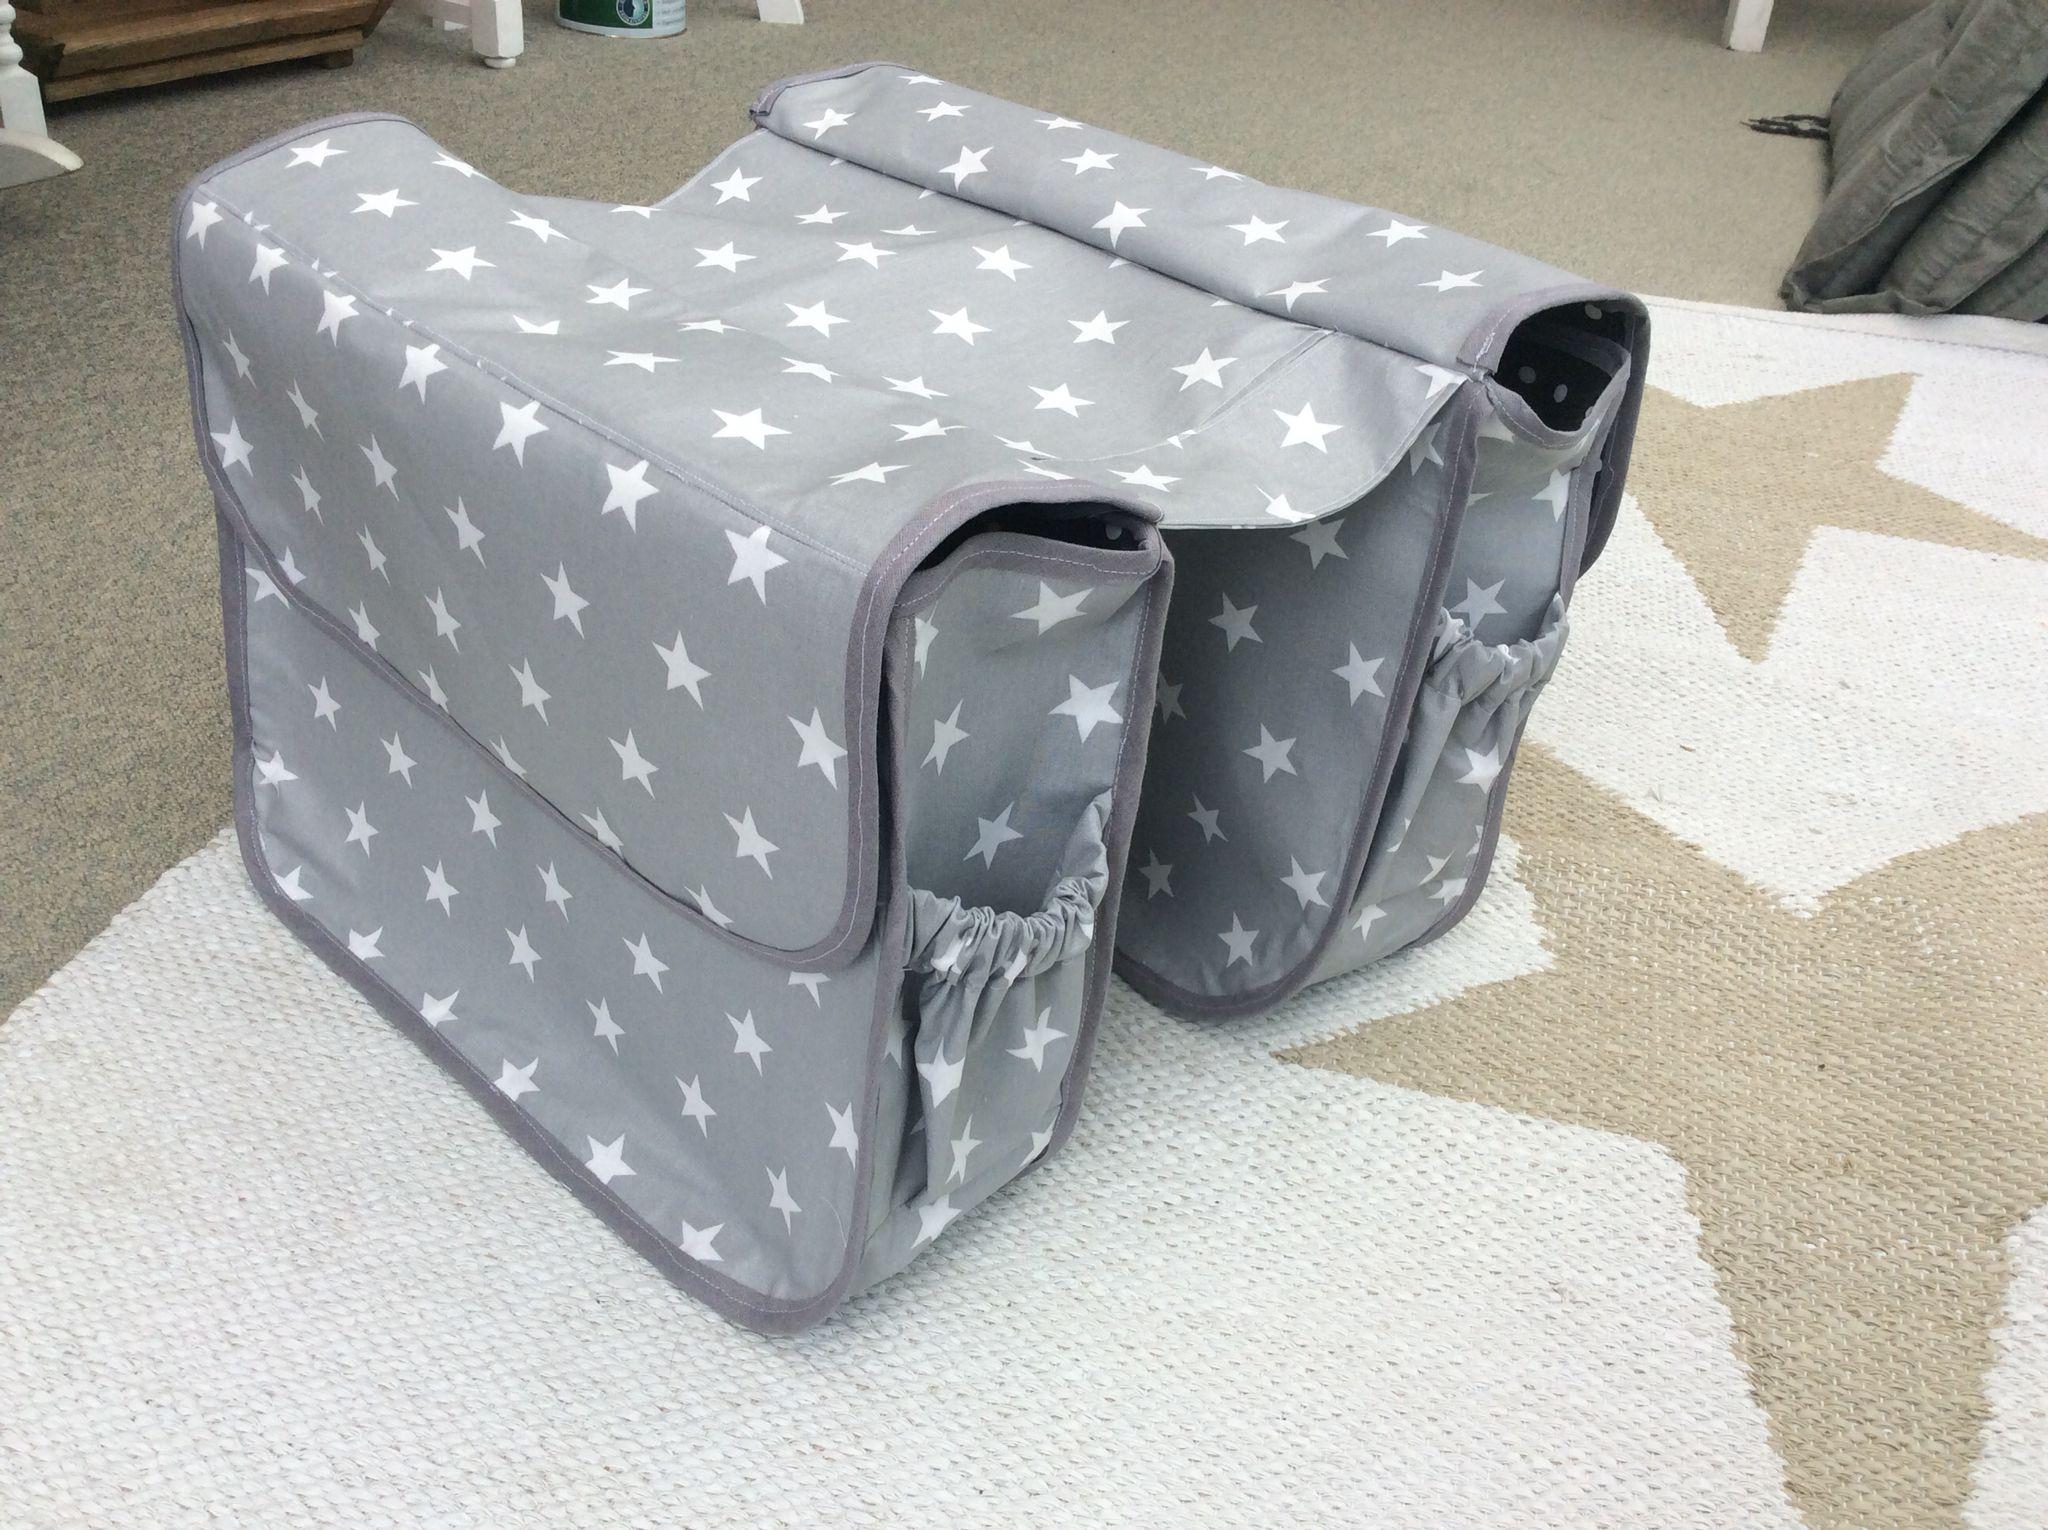 fahrrad satteltasche selbstgen ht n hen taschen n hen. Black Bedroom Furniture Sets. Home Design Ideas